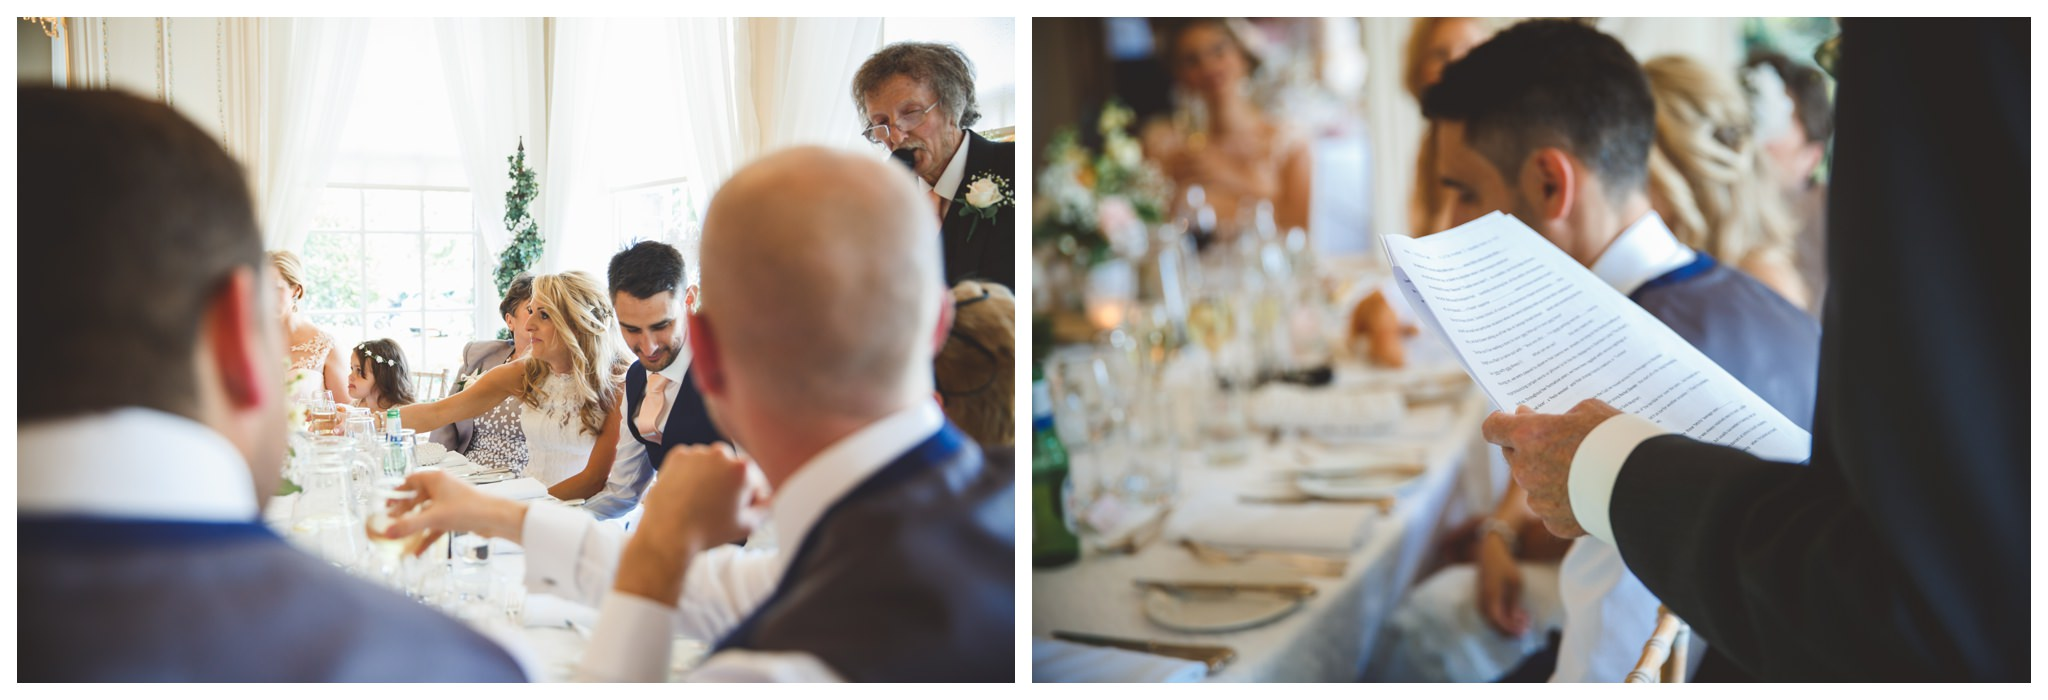 Richard Savage Photography - Wedding - Peterstone Court Brecon - 2016-05-11_0047